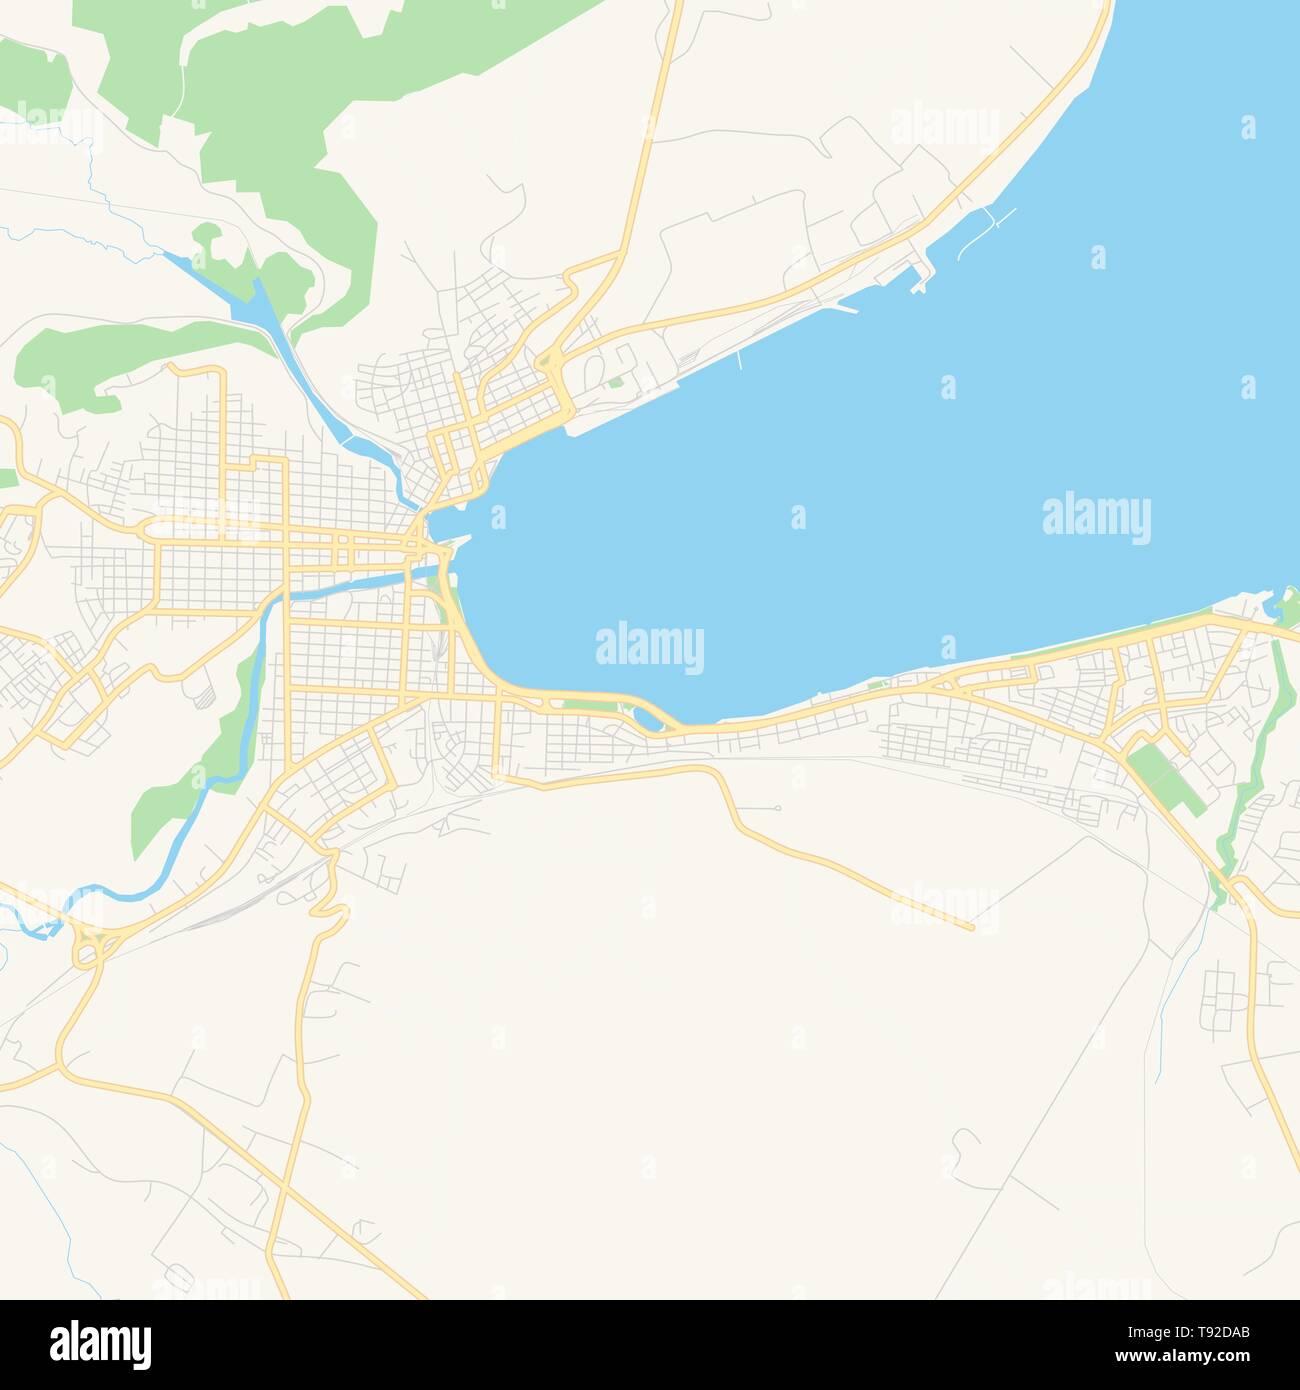 photograph regarding Printable Map of Cuba titled Cuba Printable Map Inventory Pictures Cuba Printable Map Inventory